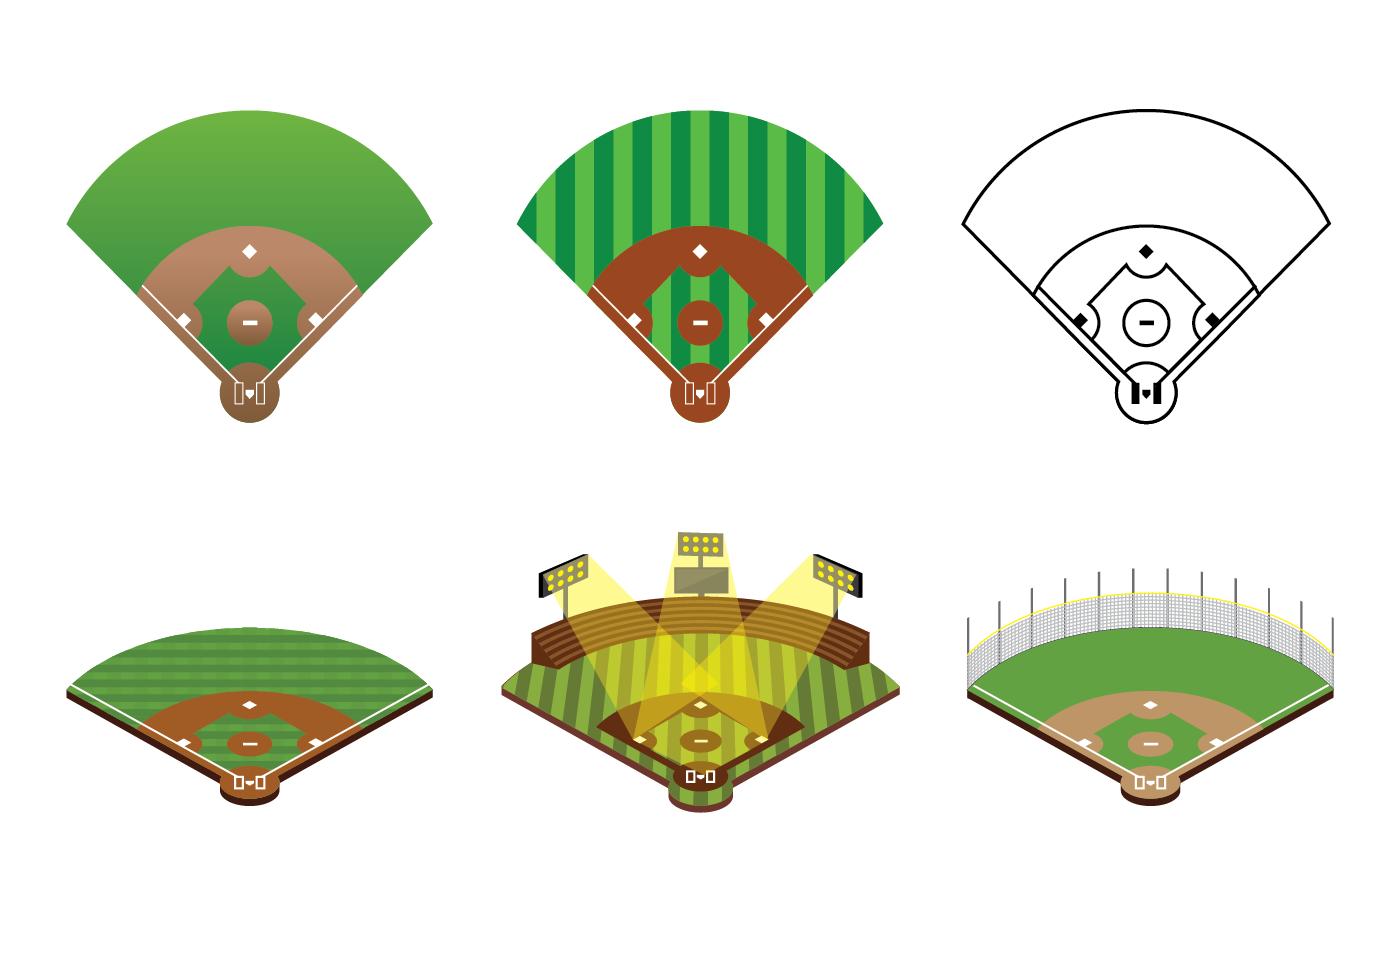 Baseball diamond vector clipart png vector black and white download Baseball Field Free Vector Art - (971 Free Downloads) vector black and white download